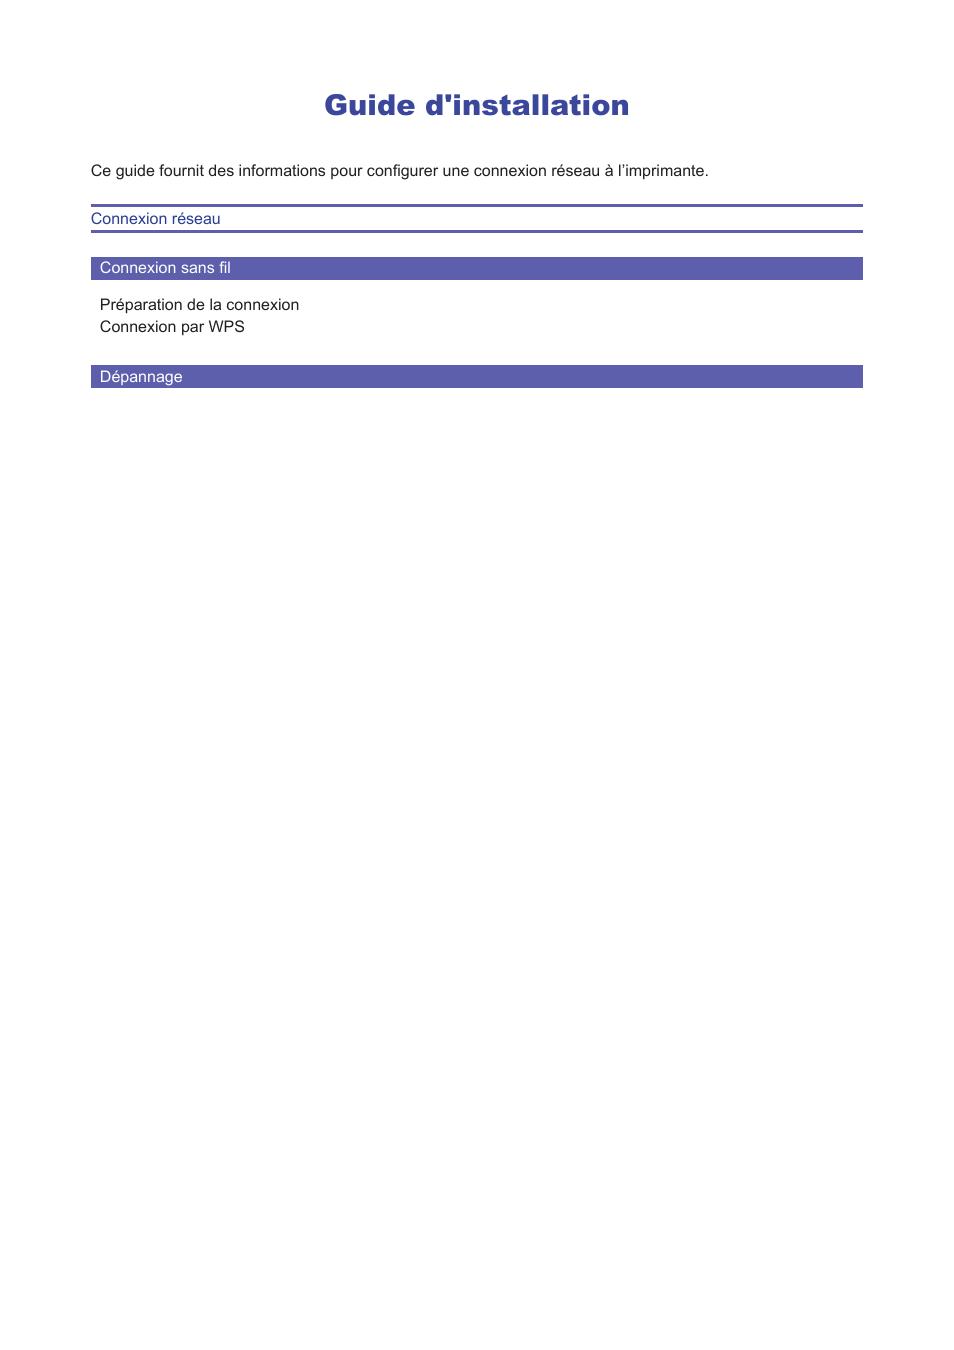 canon pixma pro 1 manual pdf